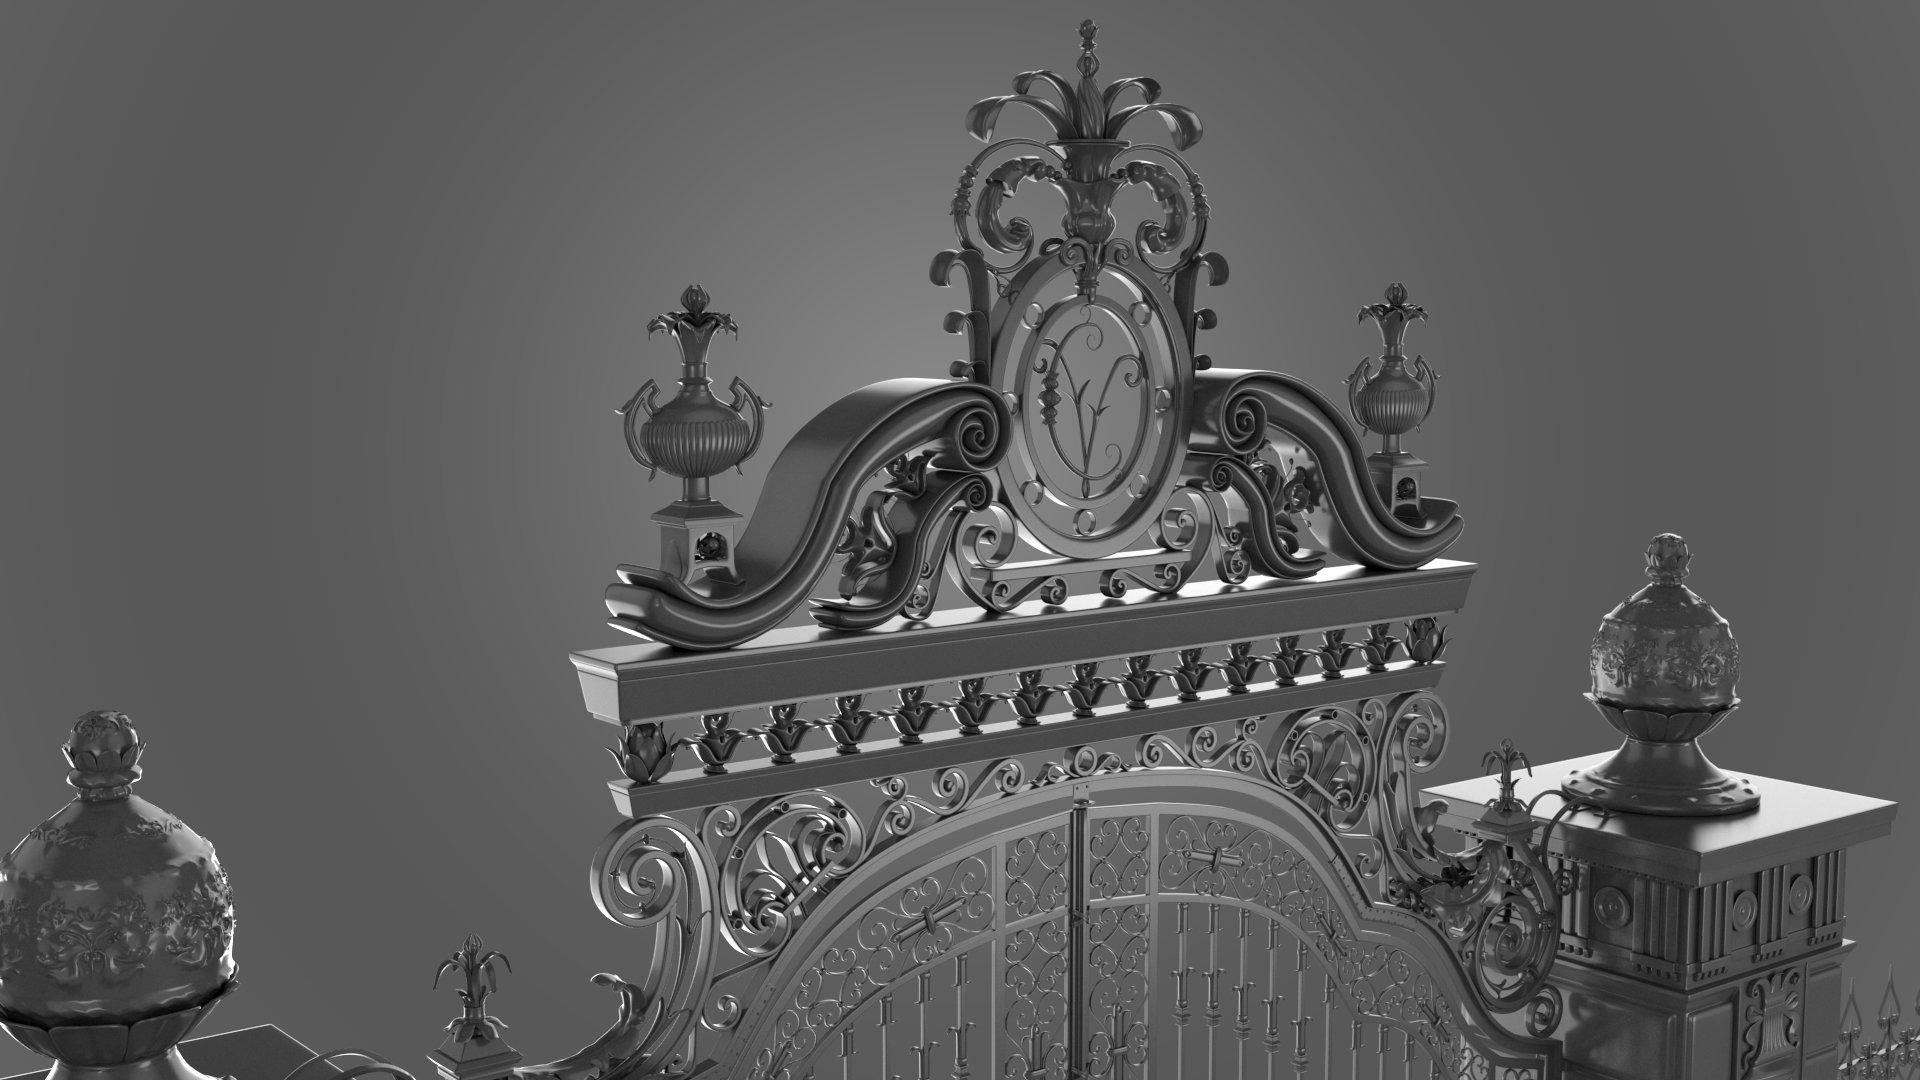 Stavros fylladitis gate 02